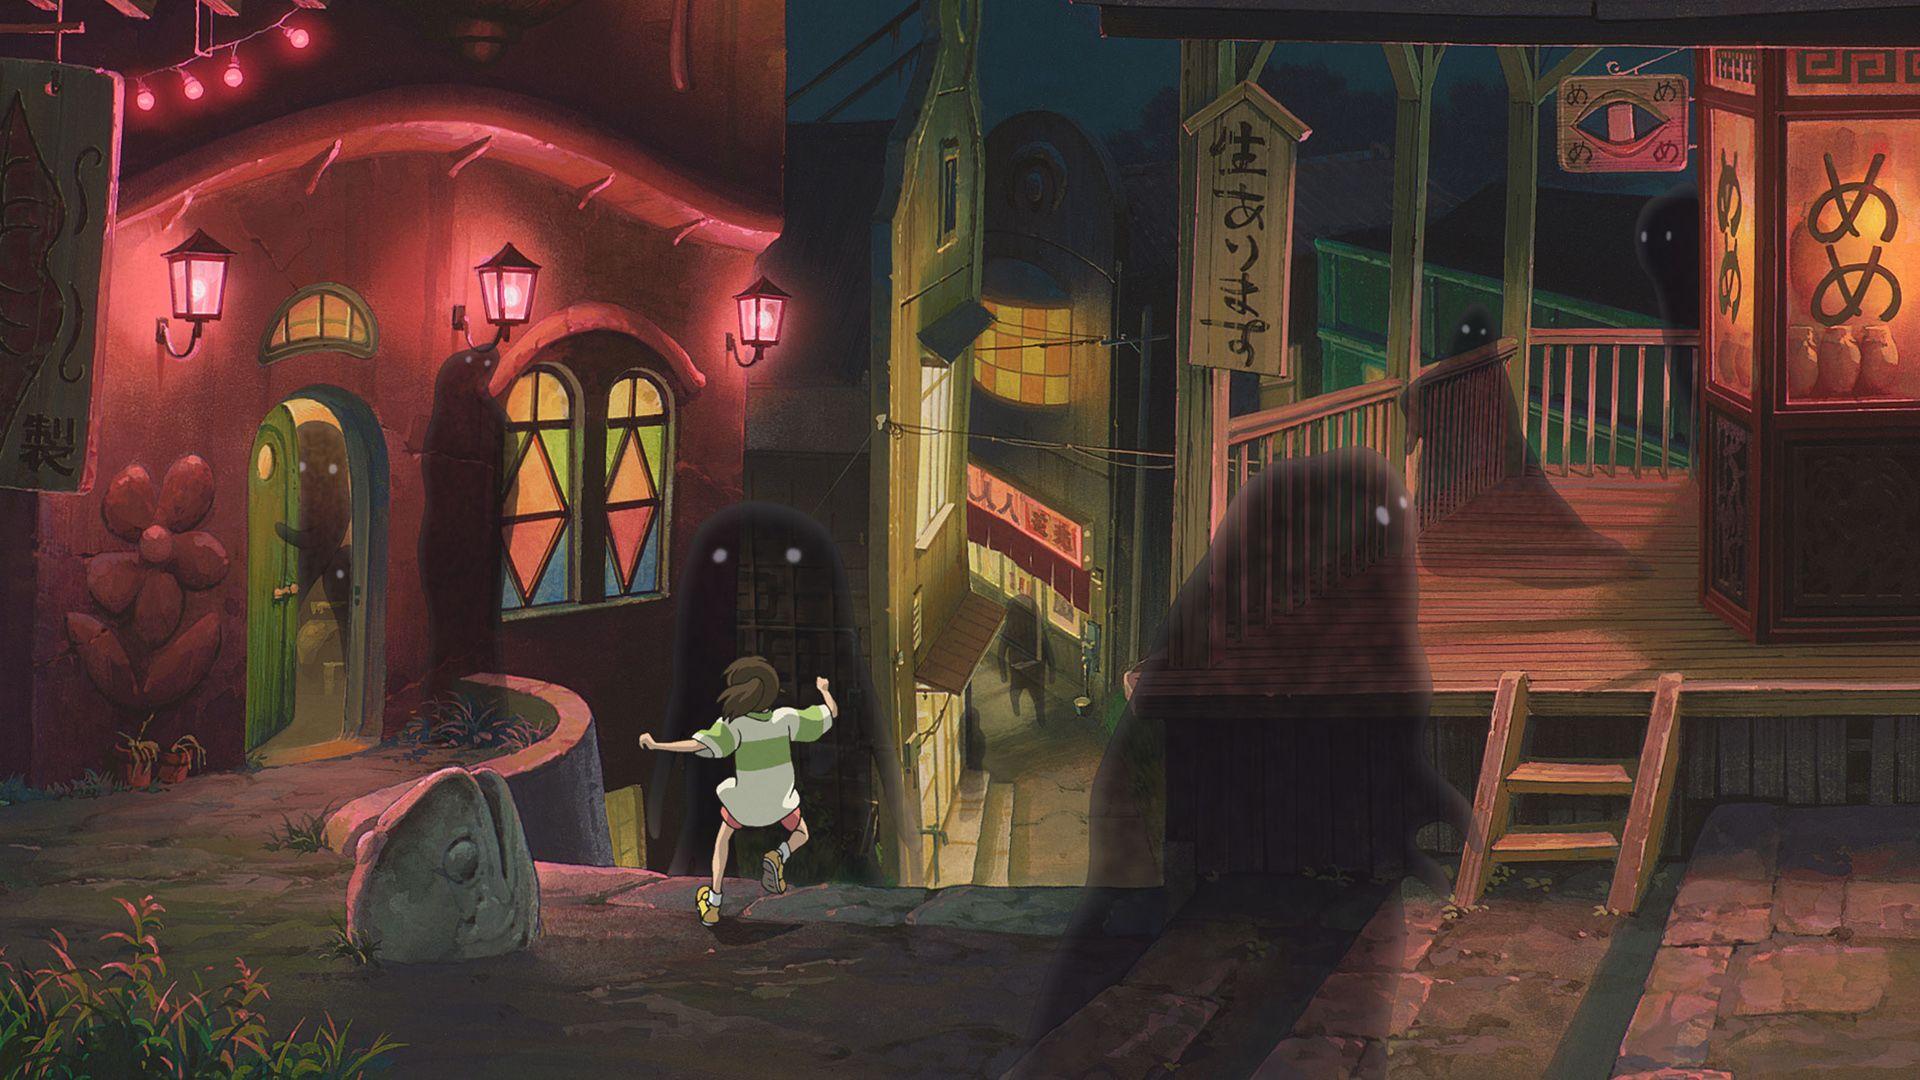 Spirited Away Hd Wallpaper 1920x1080 Studio Ghibli Movies Spirited Away Wallpaper Best Japanese Anime